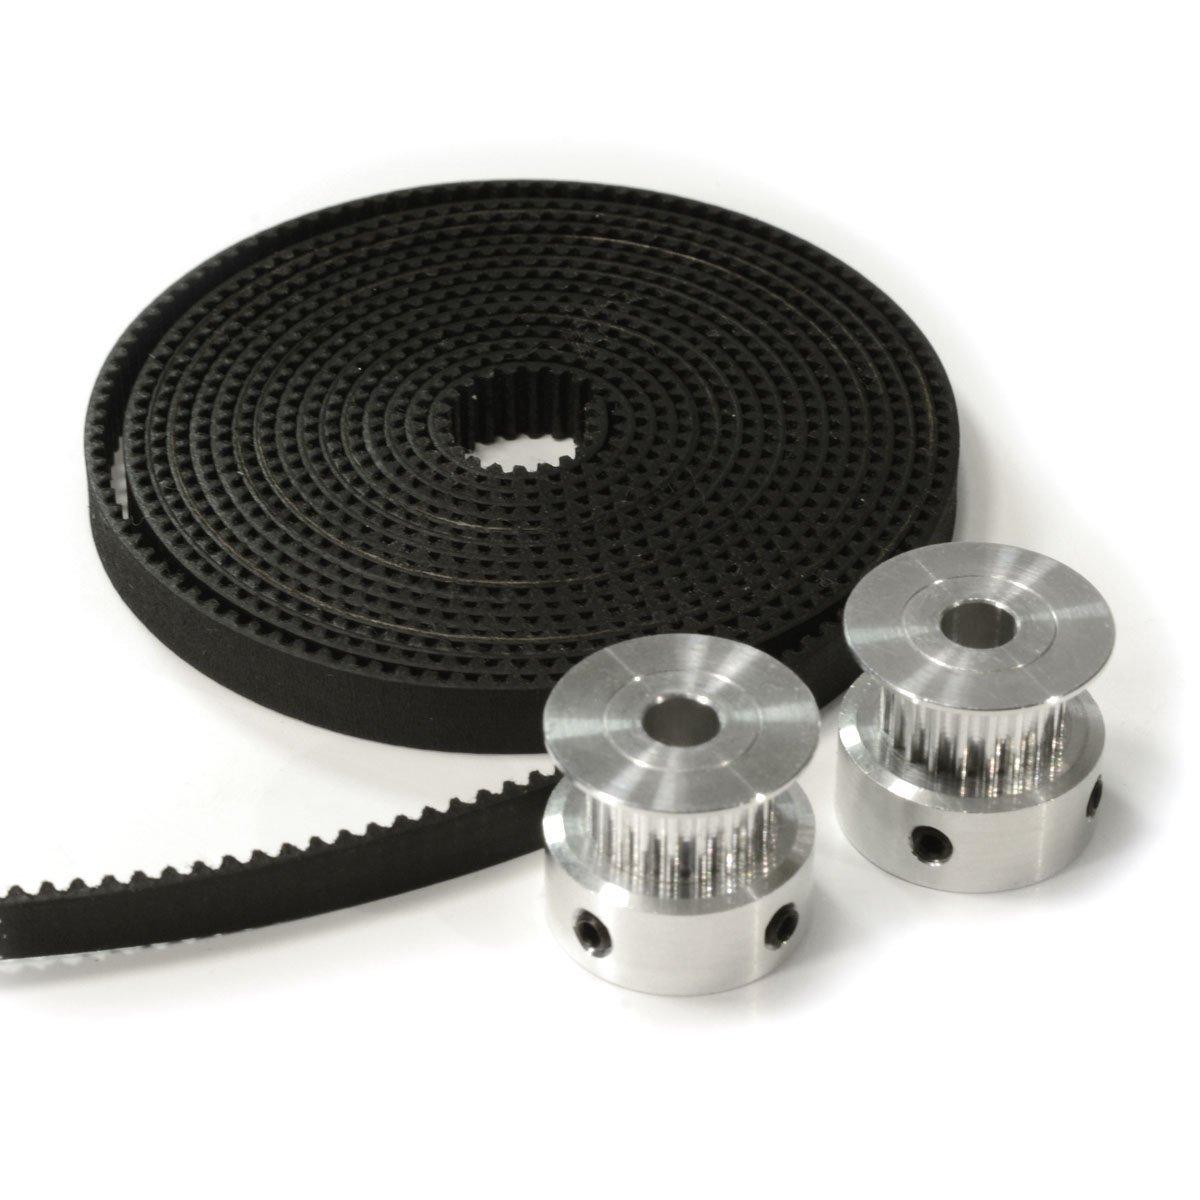 2Pcs gt2 timing pulley 20t 5//8mm 2m belt 6mm width kit for 3d printer reprap XE